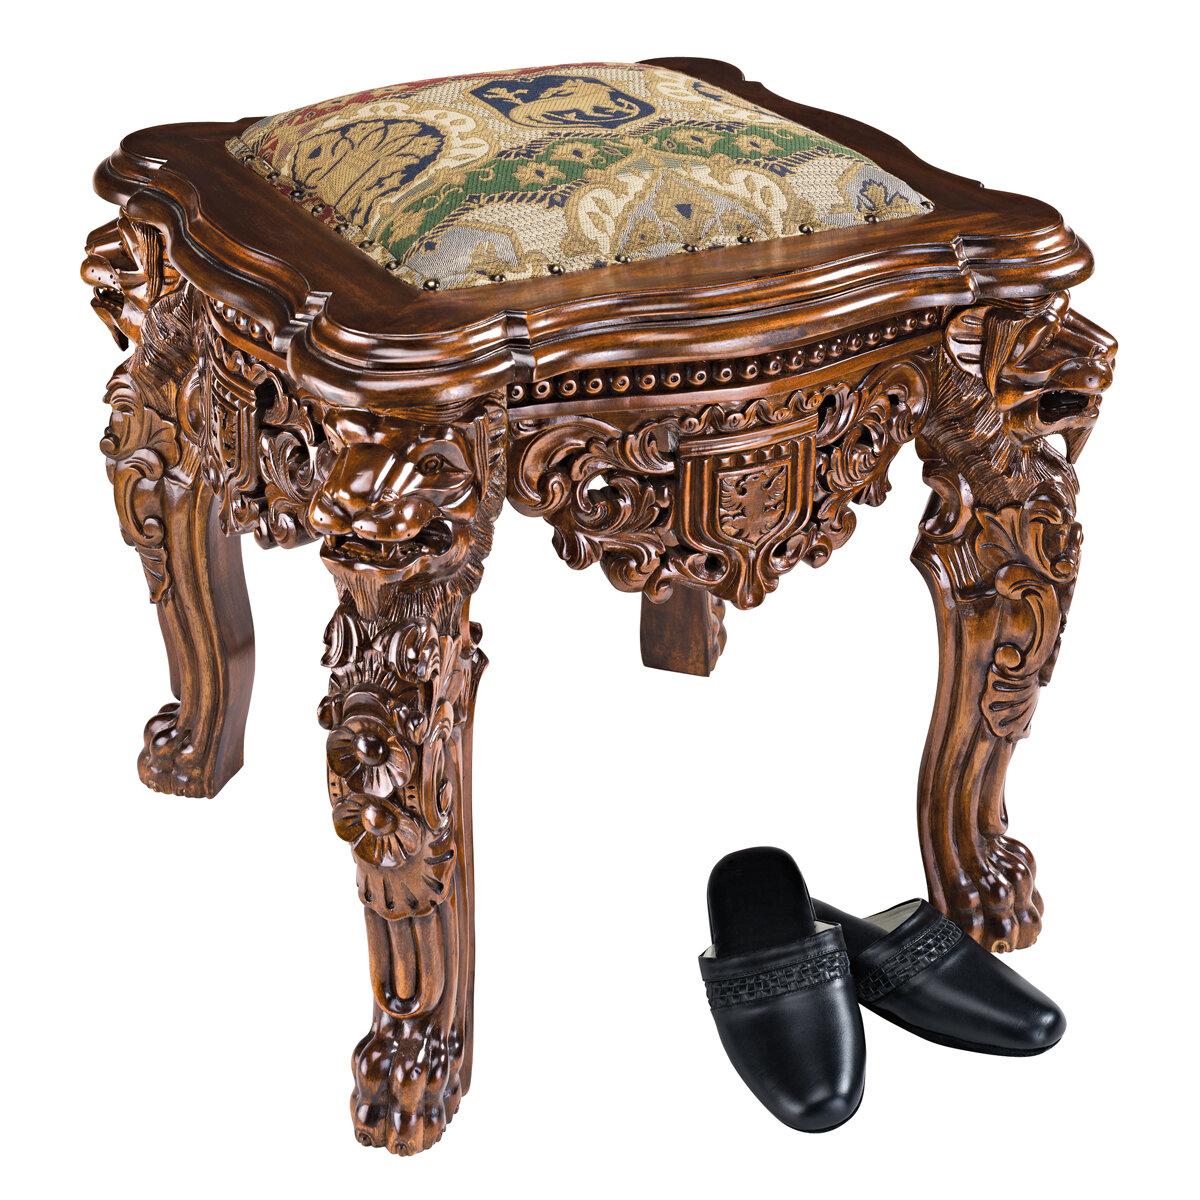 Incredible The Lord Raffles Lion Leg Gothic Stool Beatyapartments Chair Design Images Beatyapartmentscom